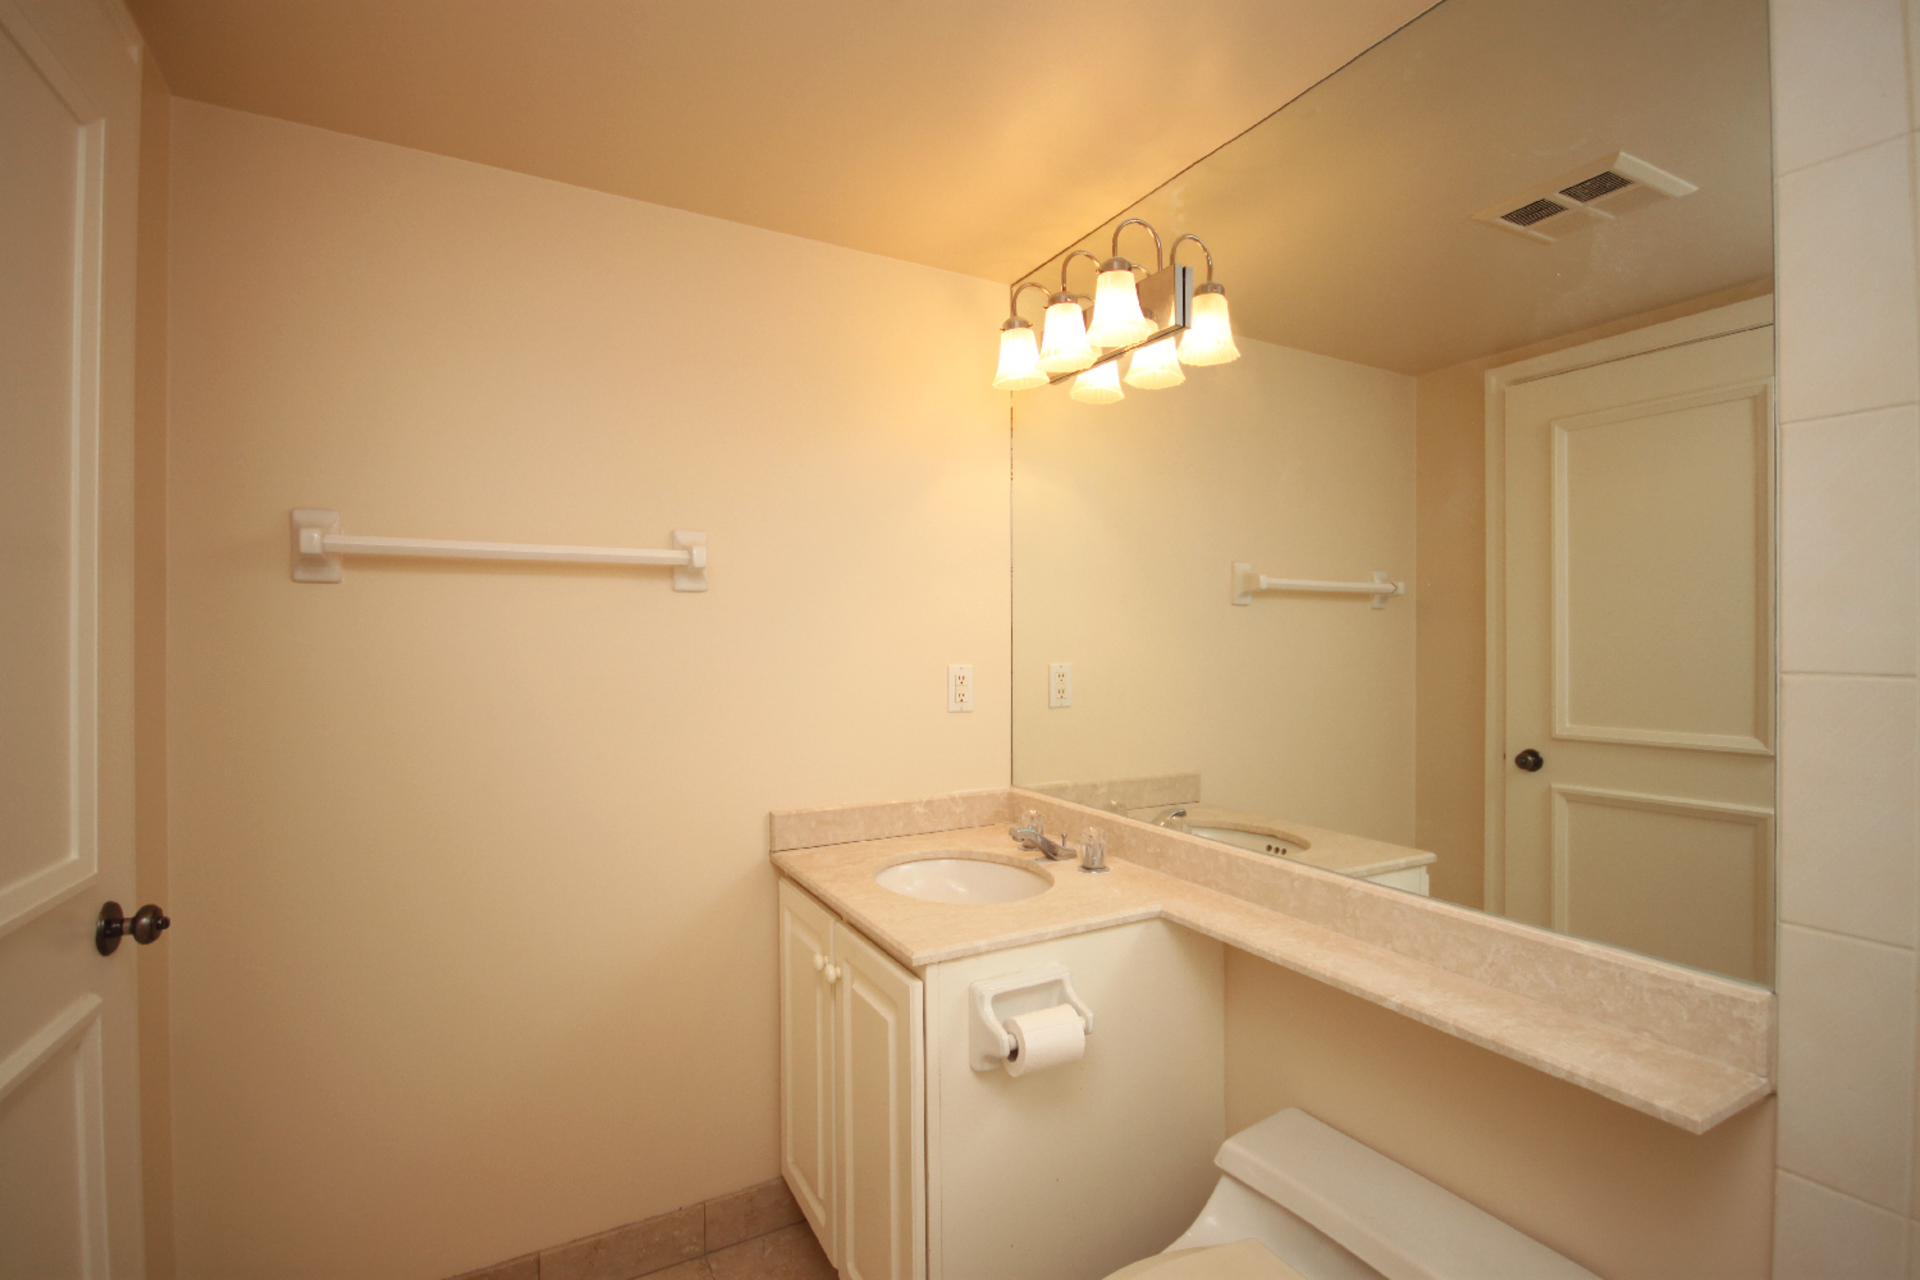 4 Piece Bathroom at 319 - 3800 Yonge Street, Bedford Park-Nortown, Toronto